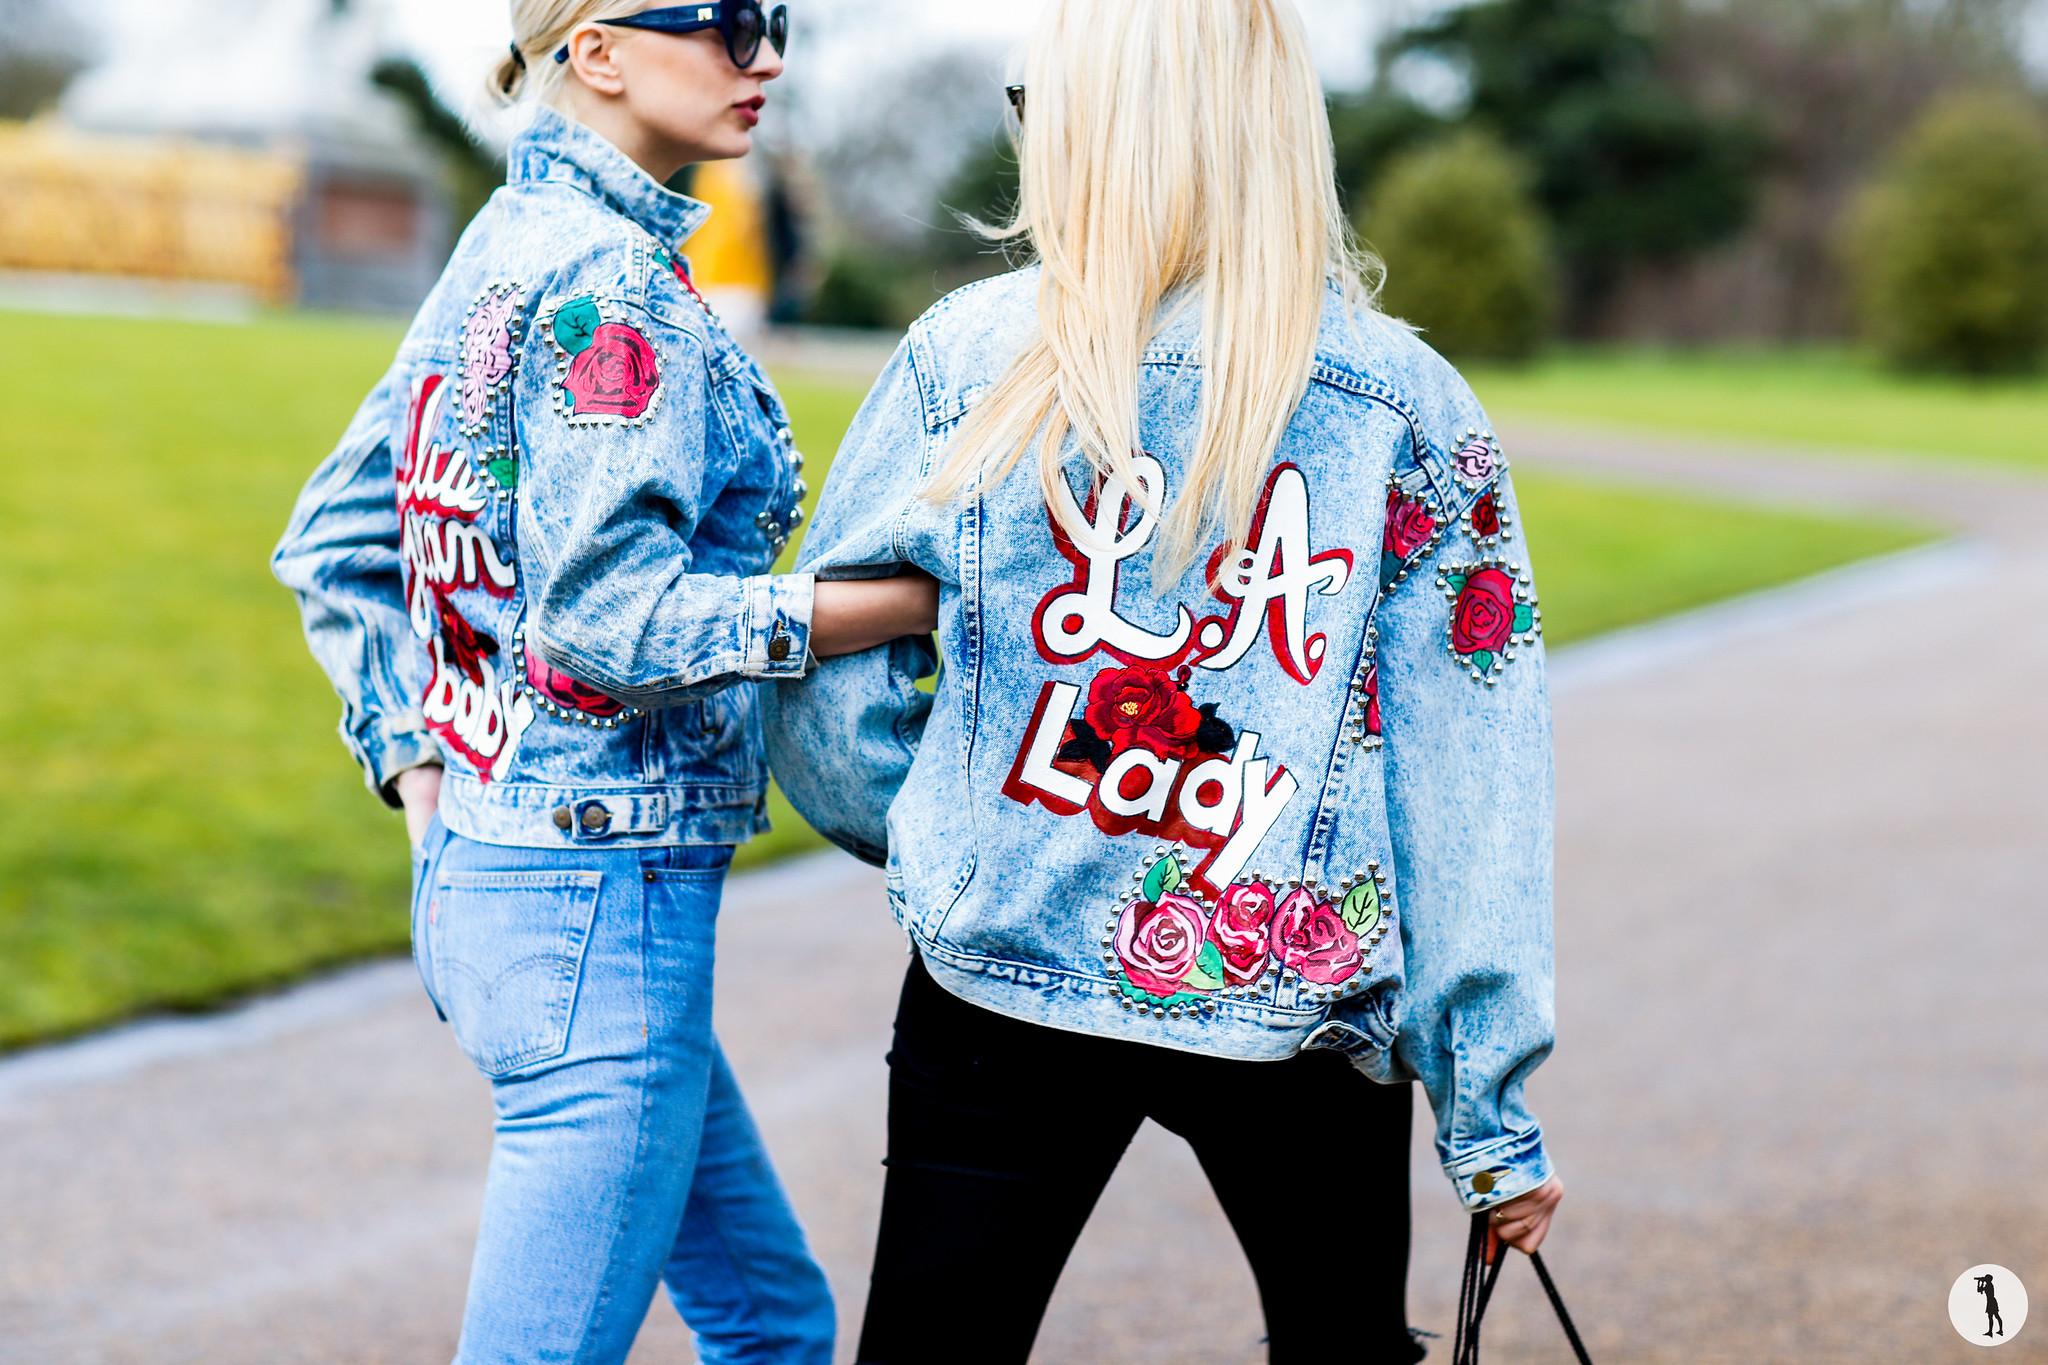 Caroline Vreeland and Shea Marie - London Fashion Week RDT FW16-17 (1)